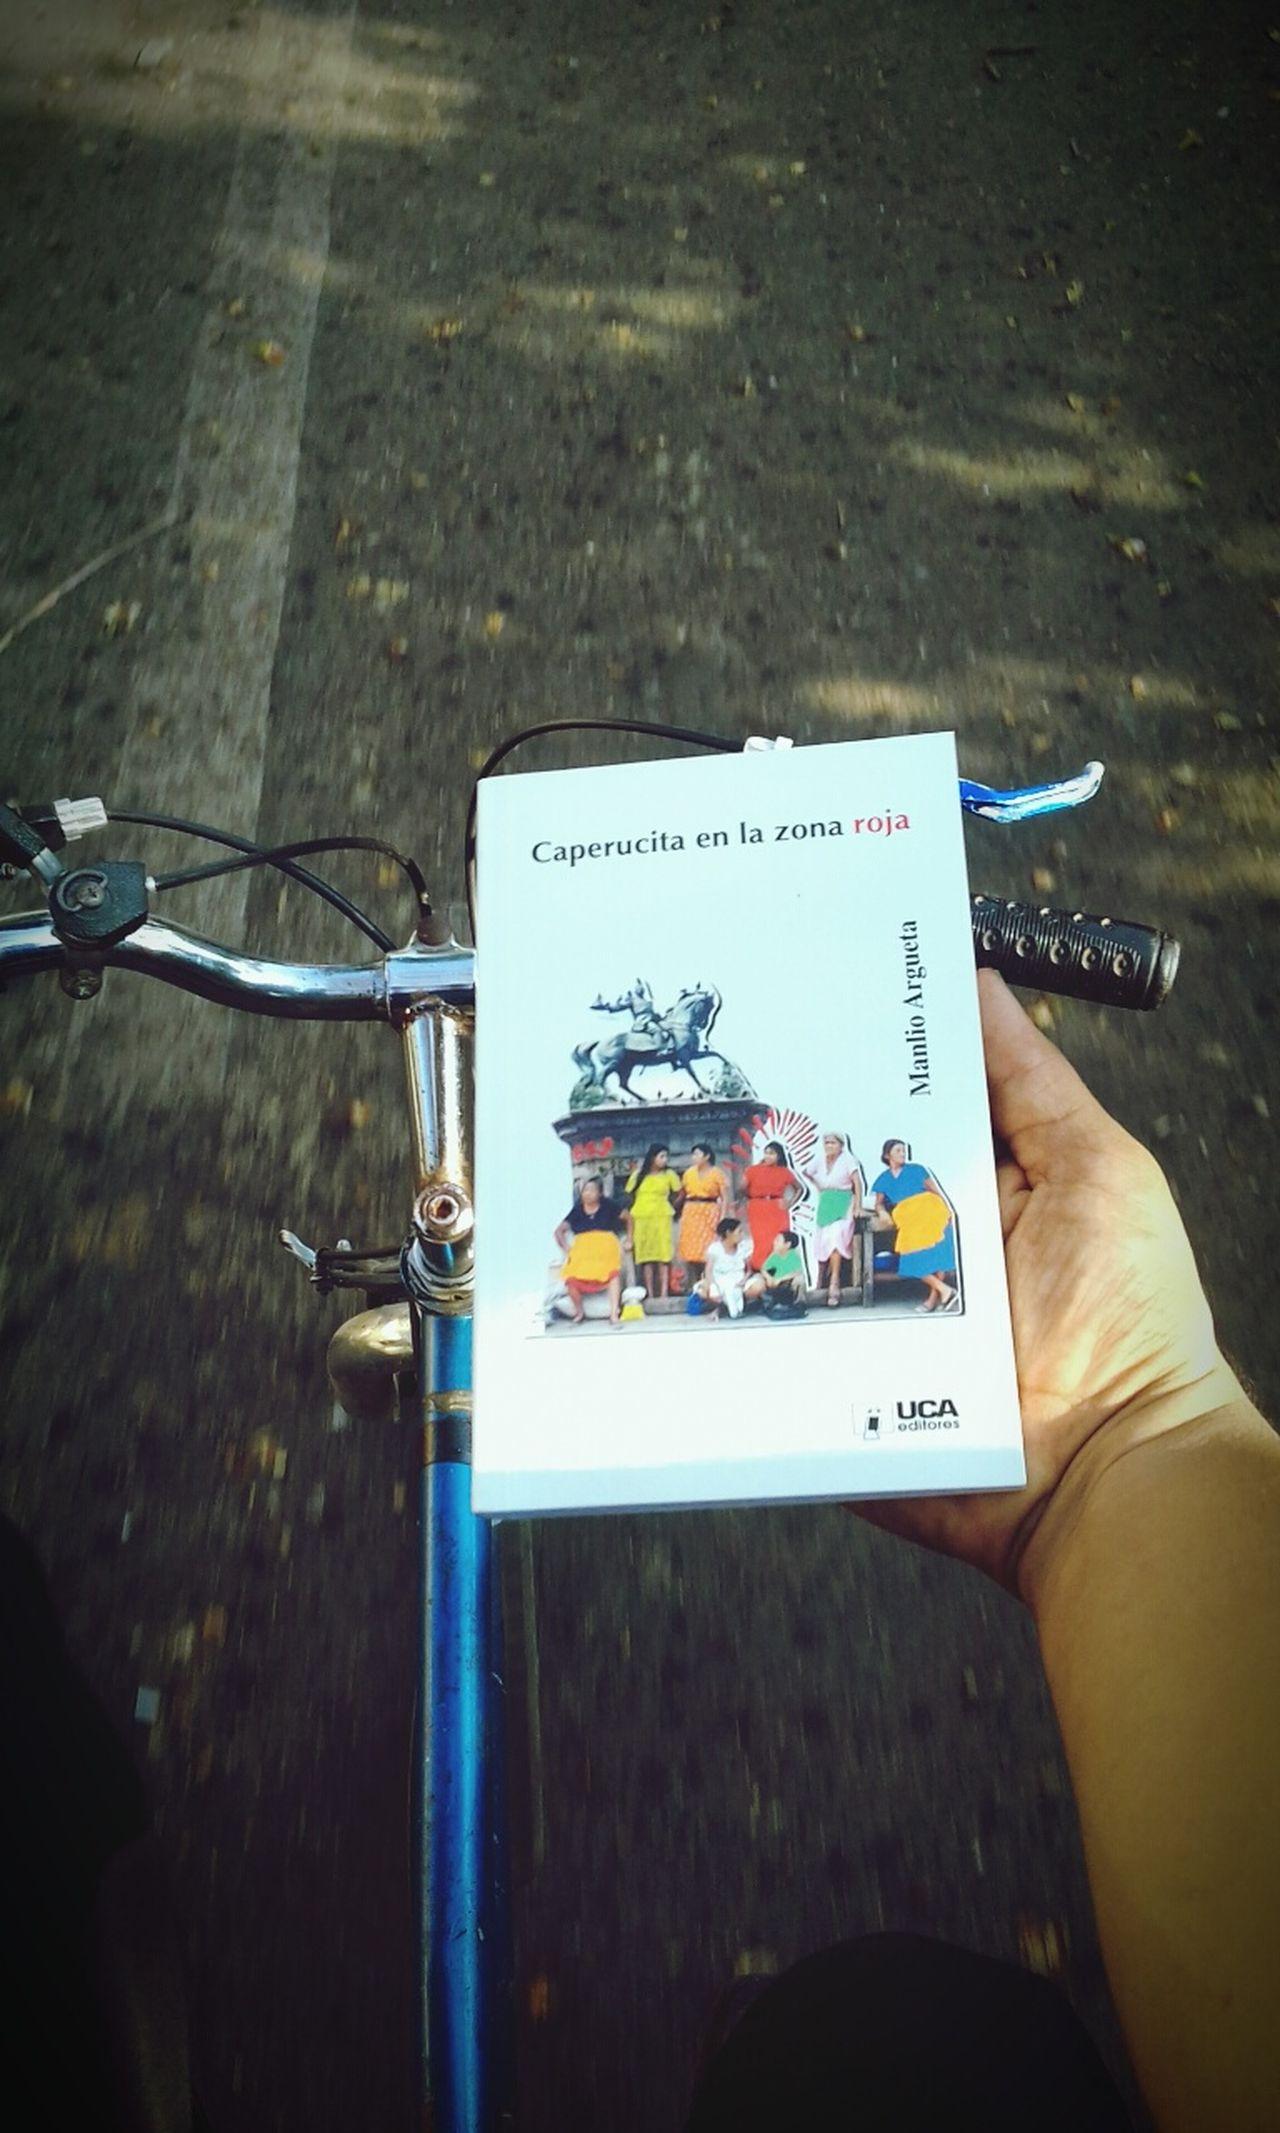 Outdoors One Person Human Body Part Close-up Human Hand Adult Bike Biker Bike Ride Ontheroad Onthestreet Ontheway Read Reading Reader Book